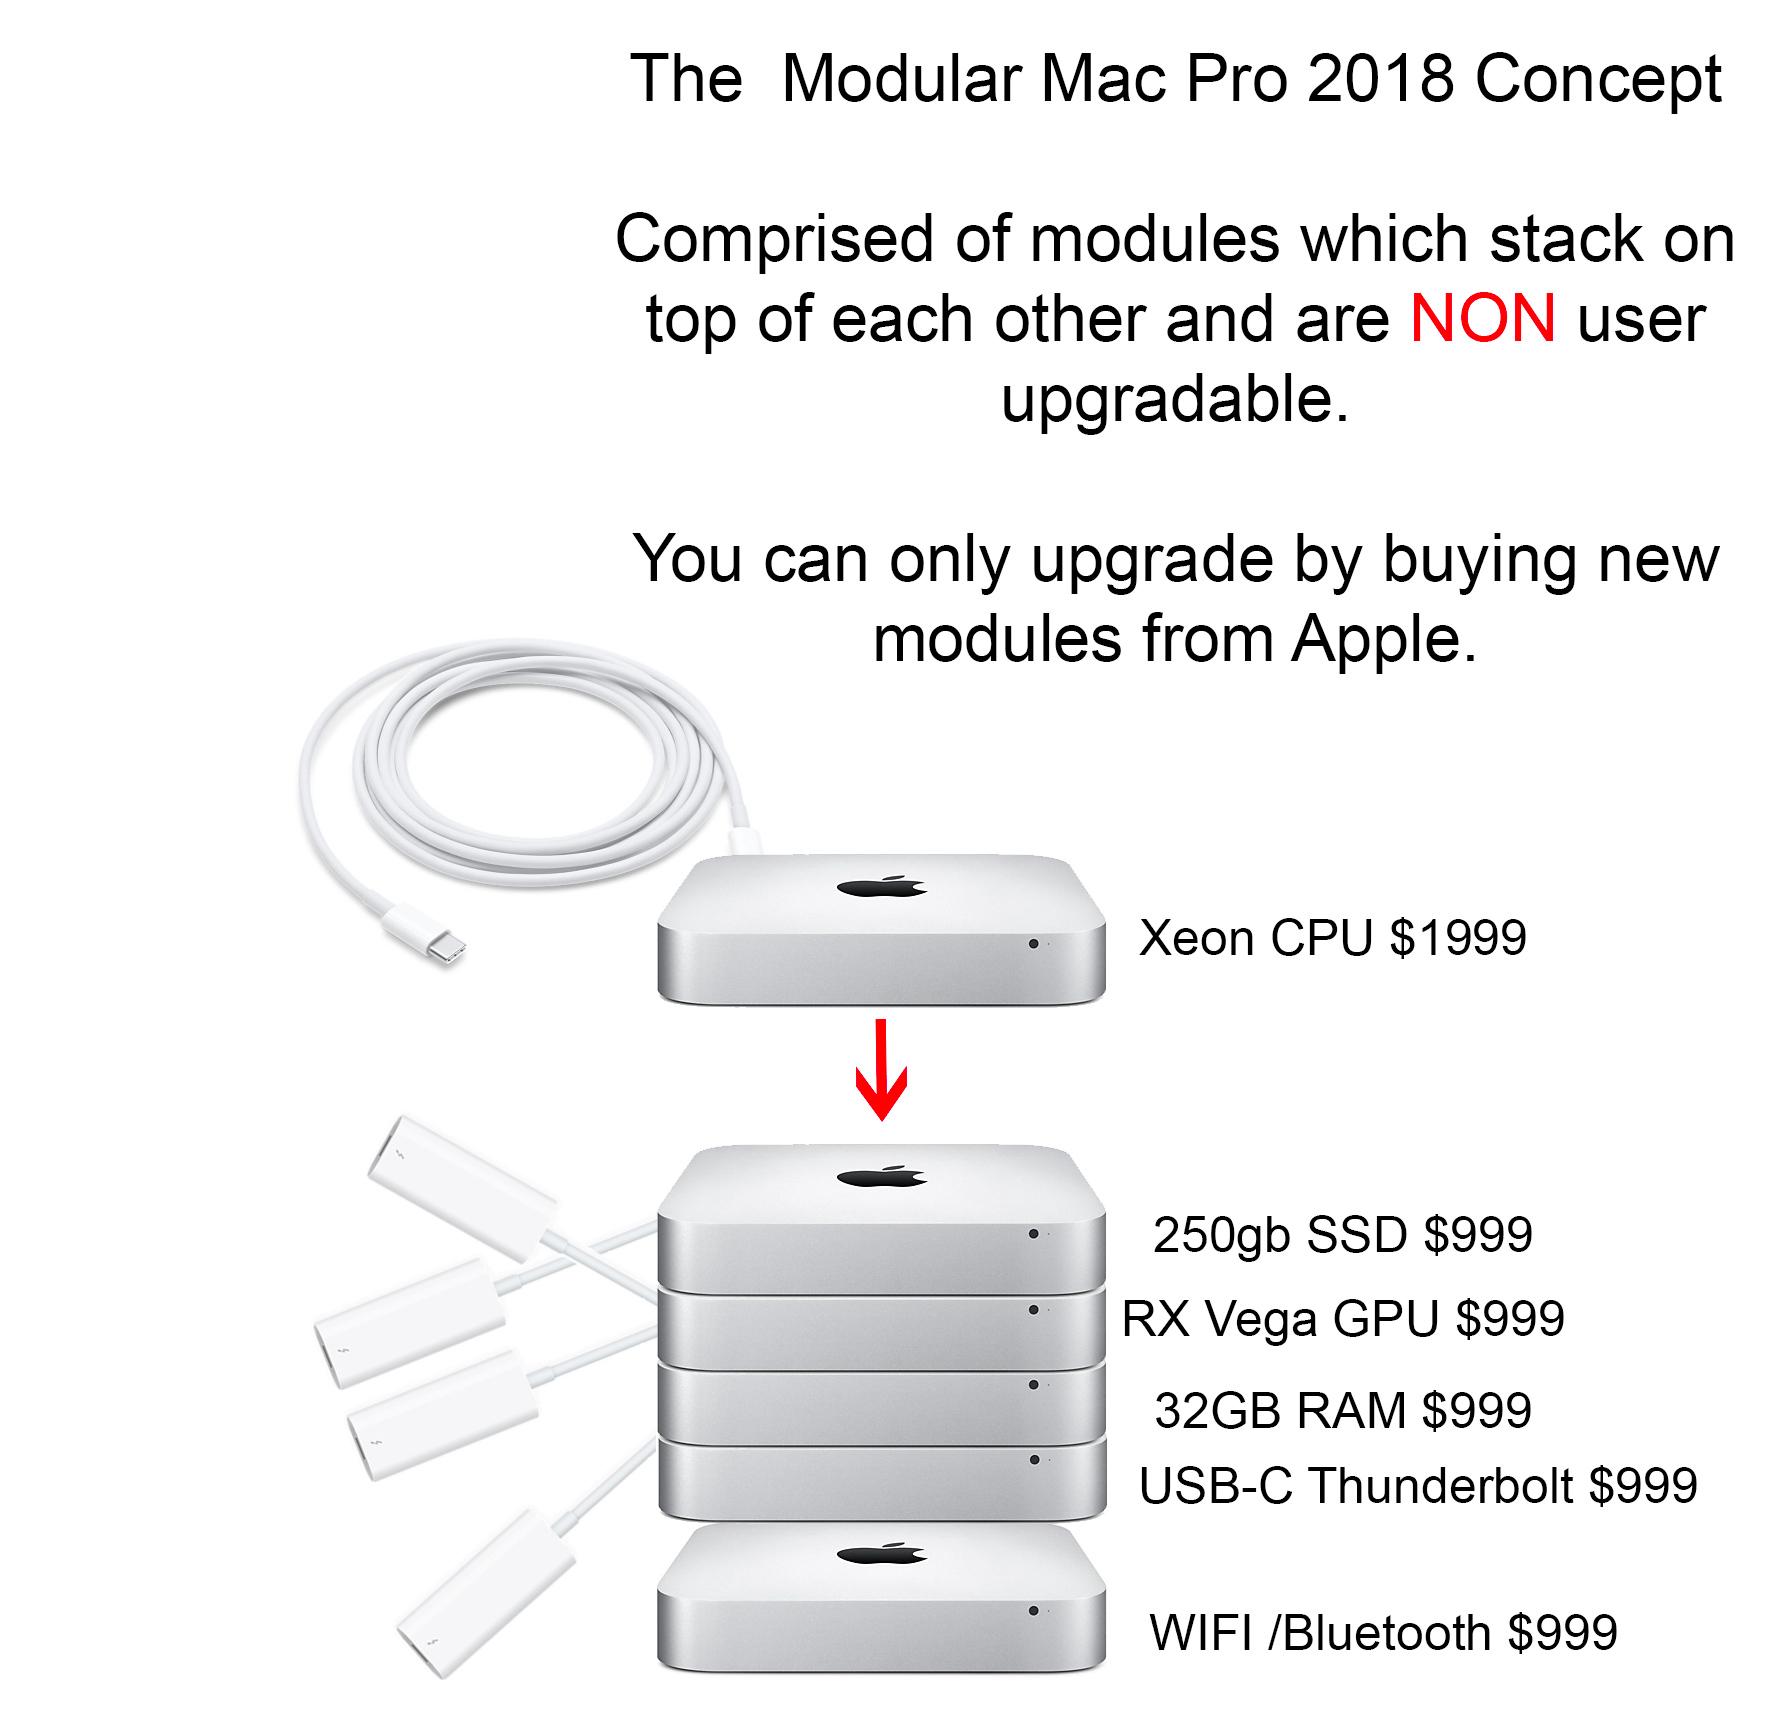 modular-mac-pro-concept.jpg